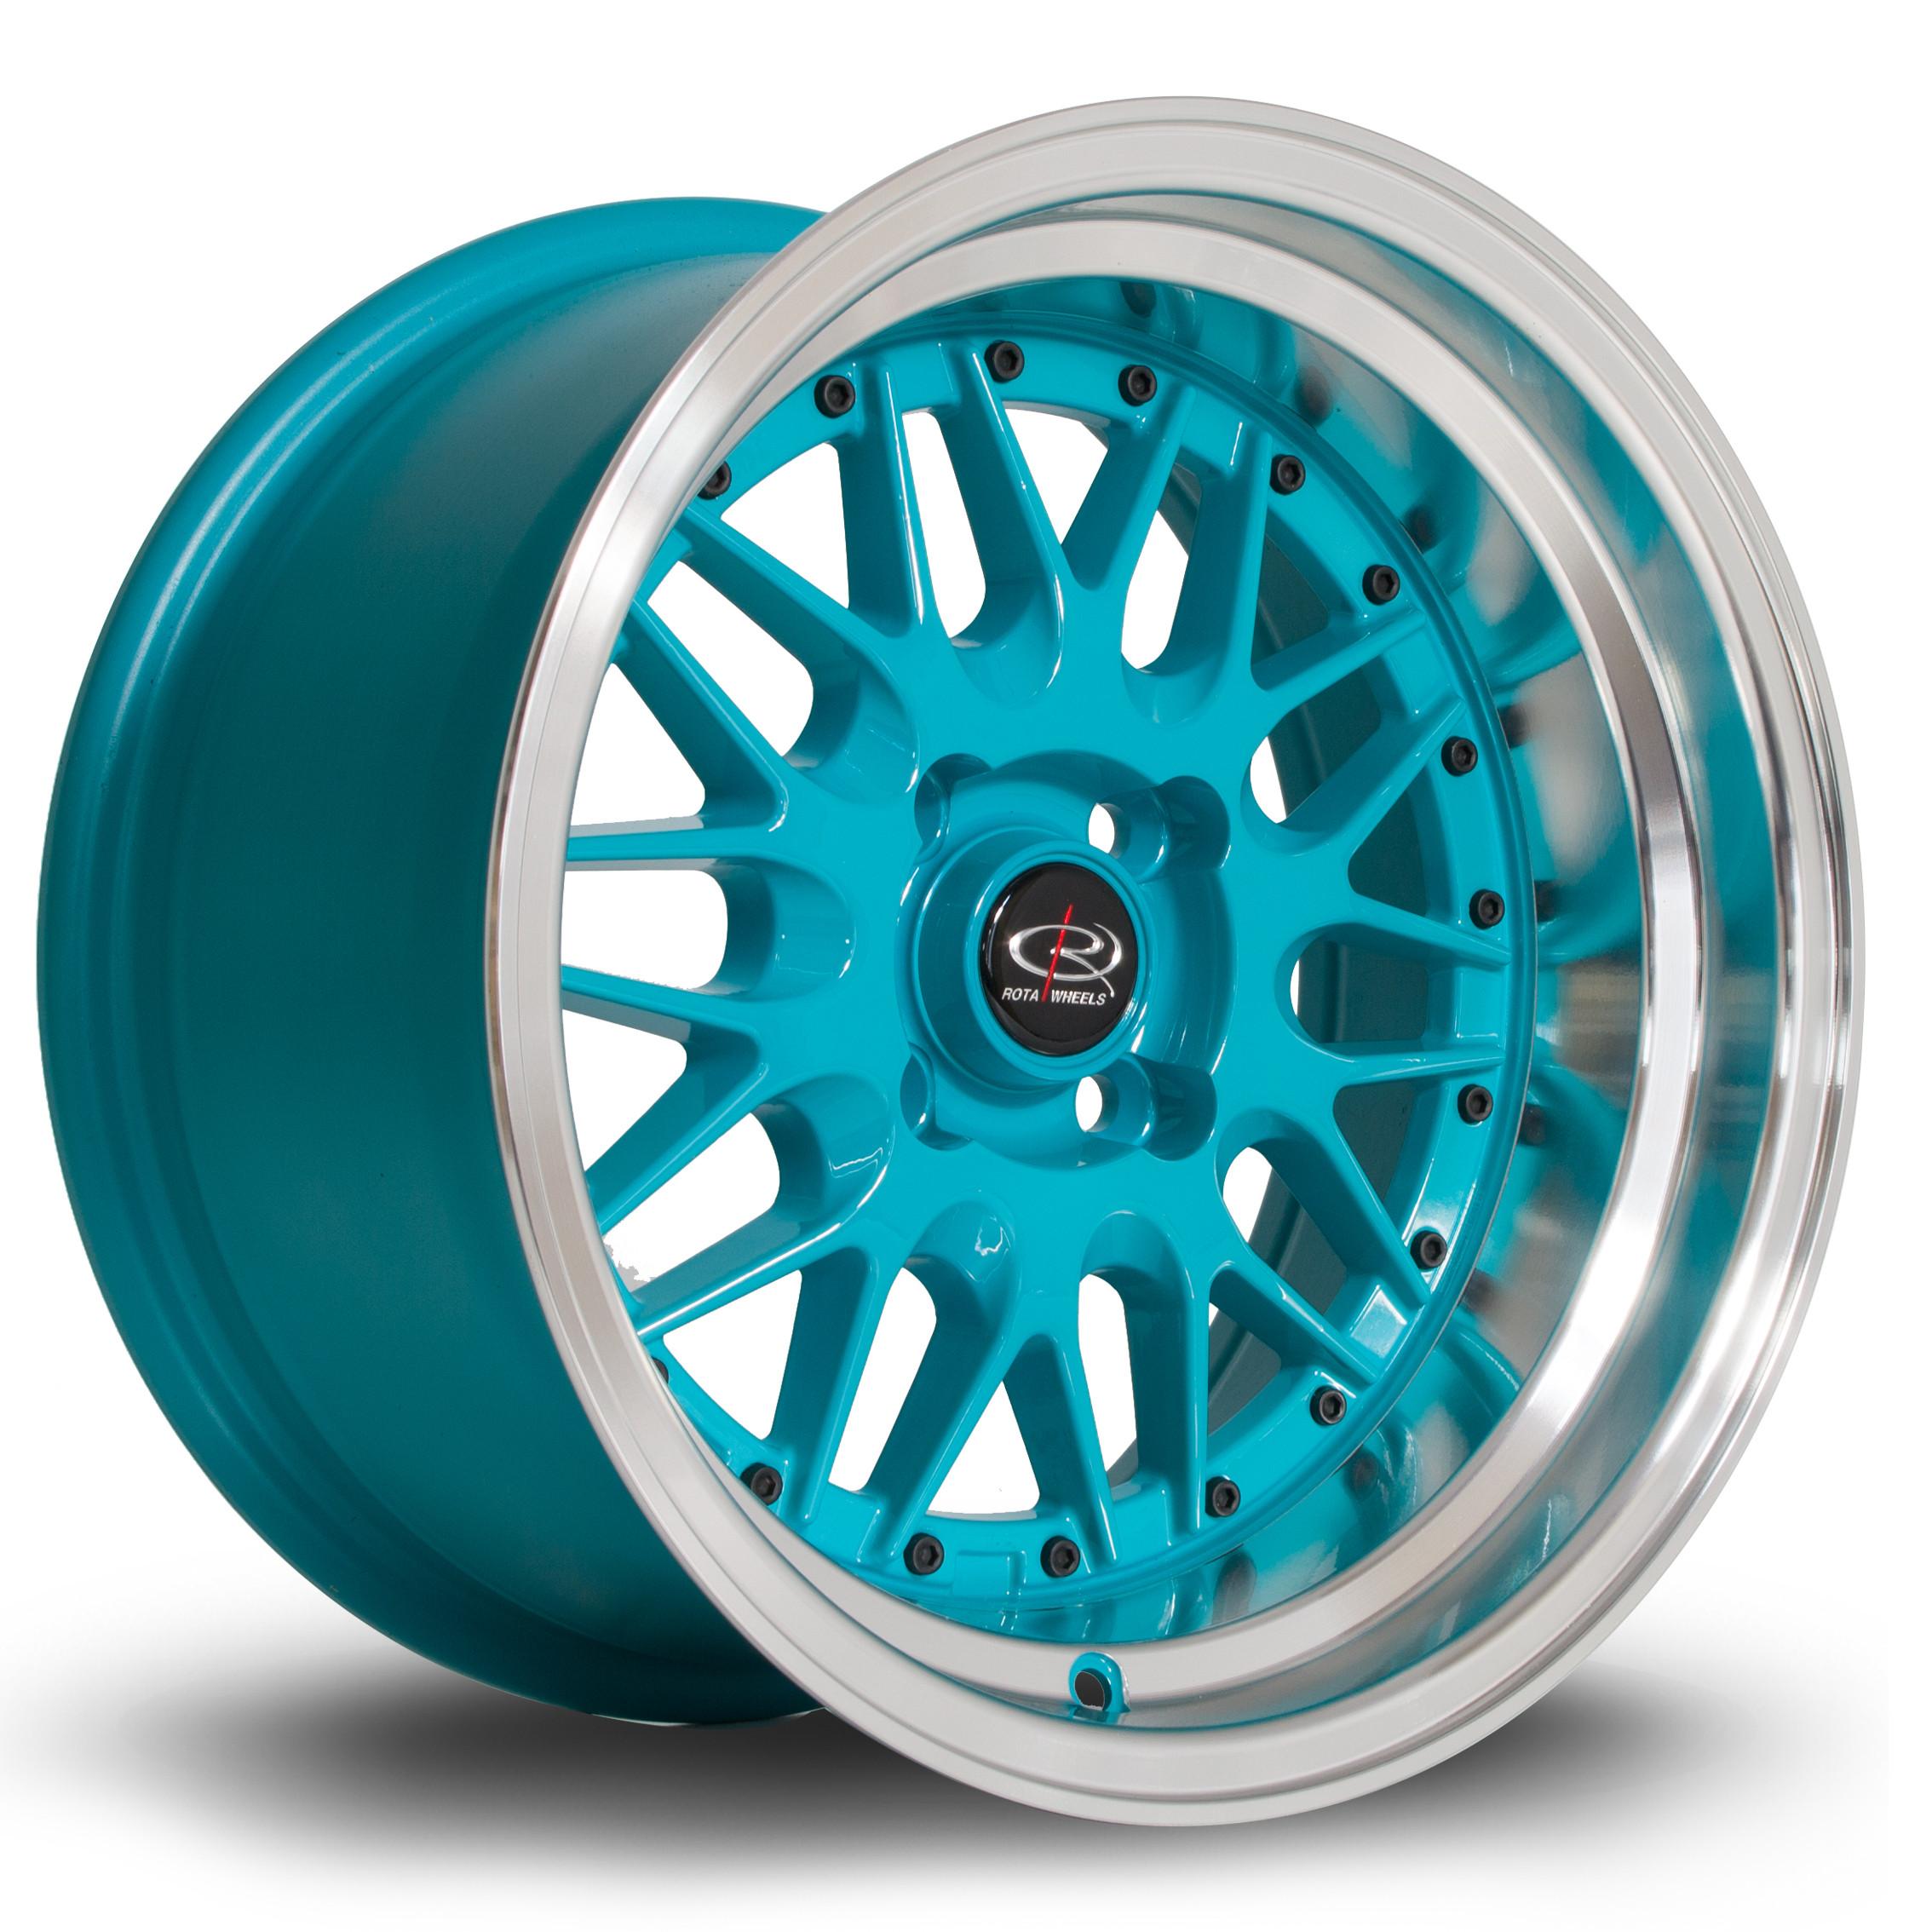 Kensei 15x8 4x100 ET0 Teal with Polished Lip - Rota Wheels